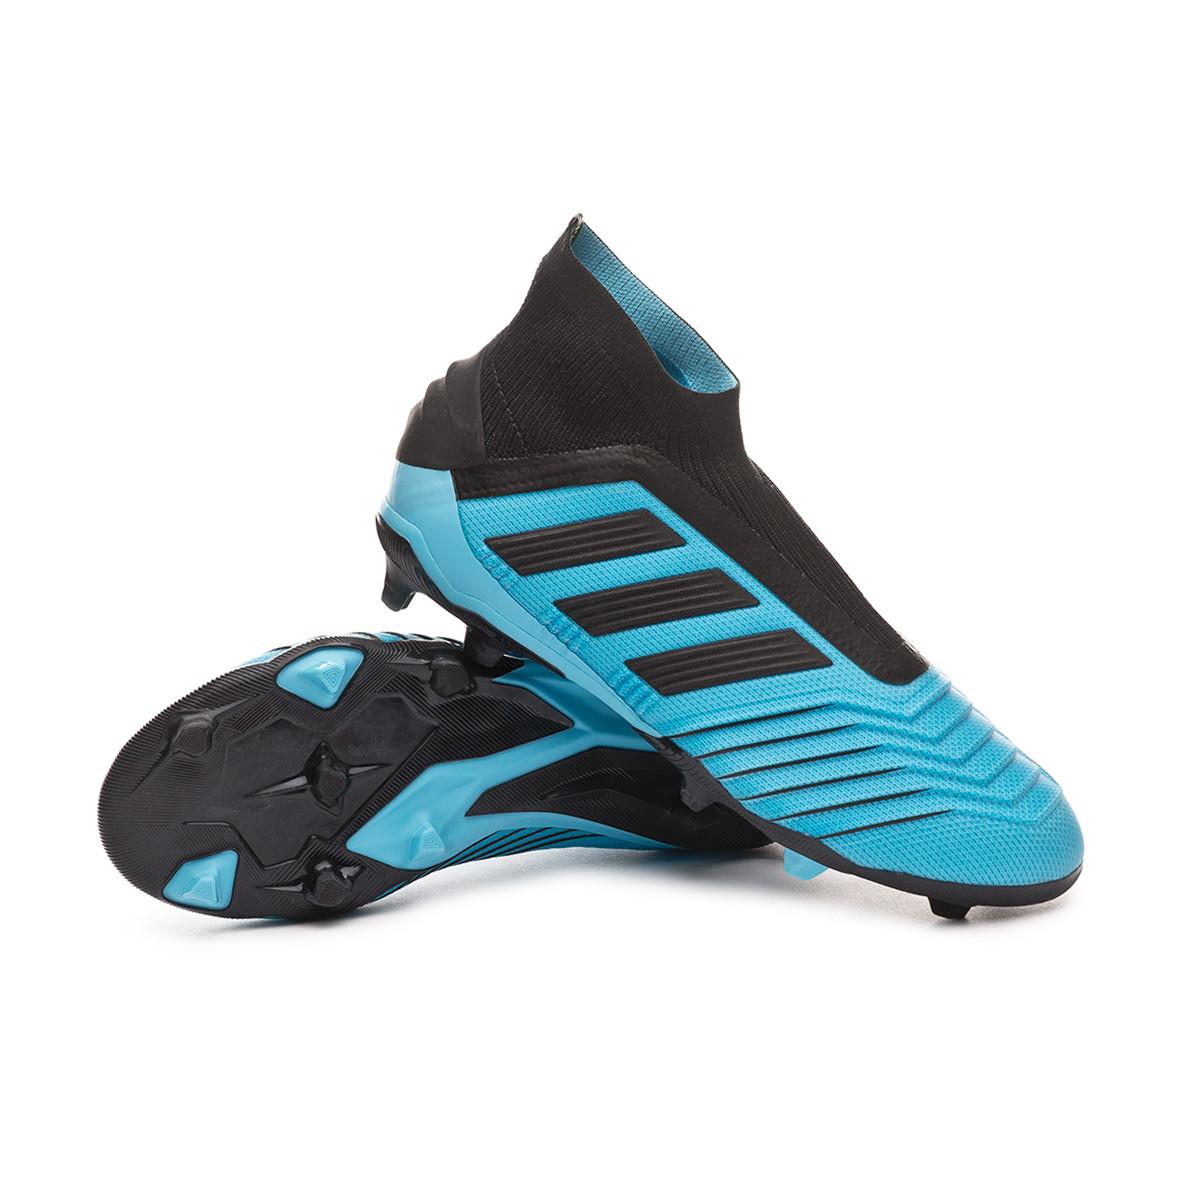 Chaussure de foot adidas Predator 19+ FG Niño